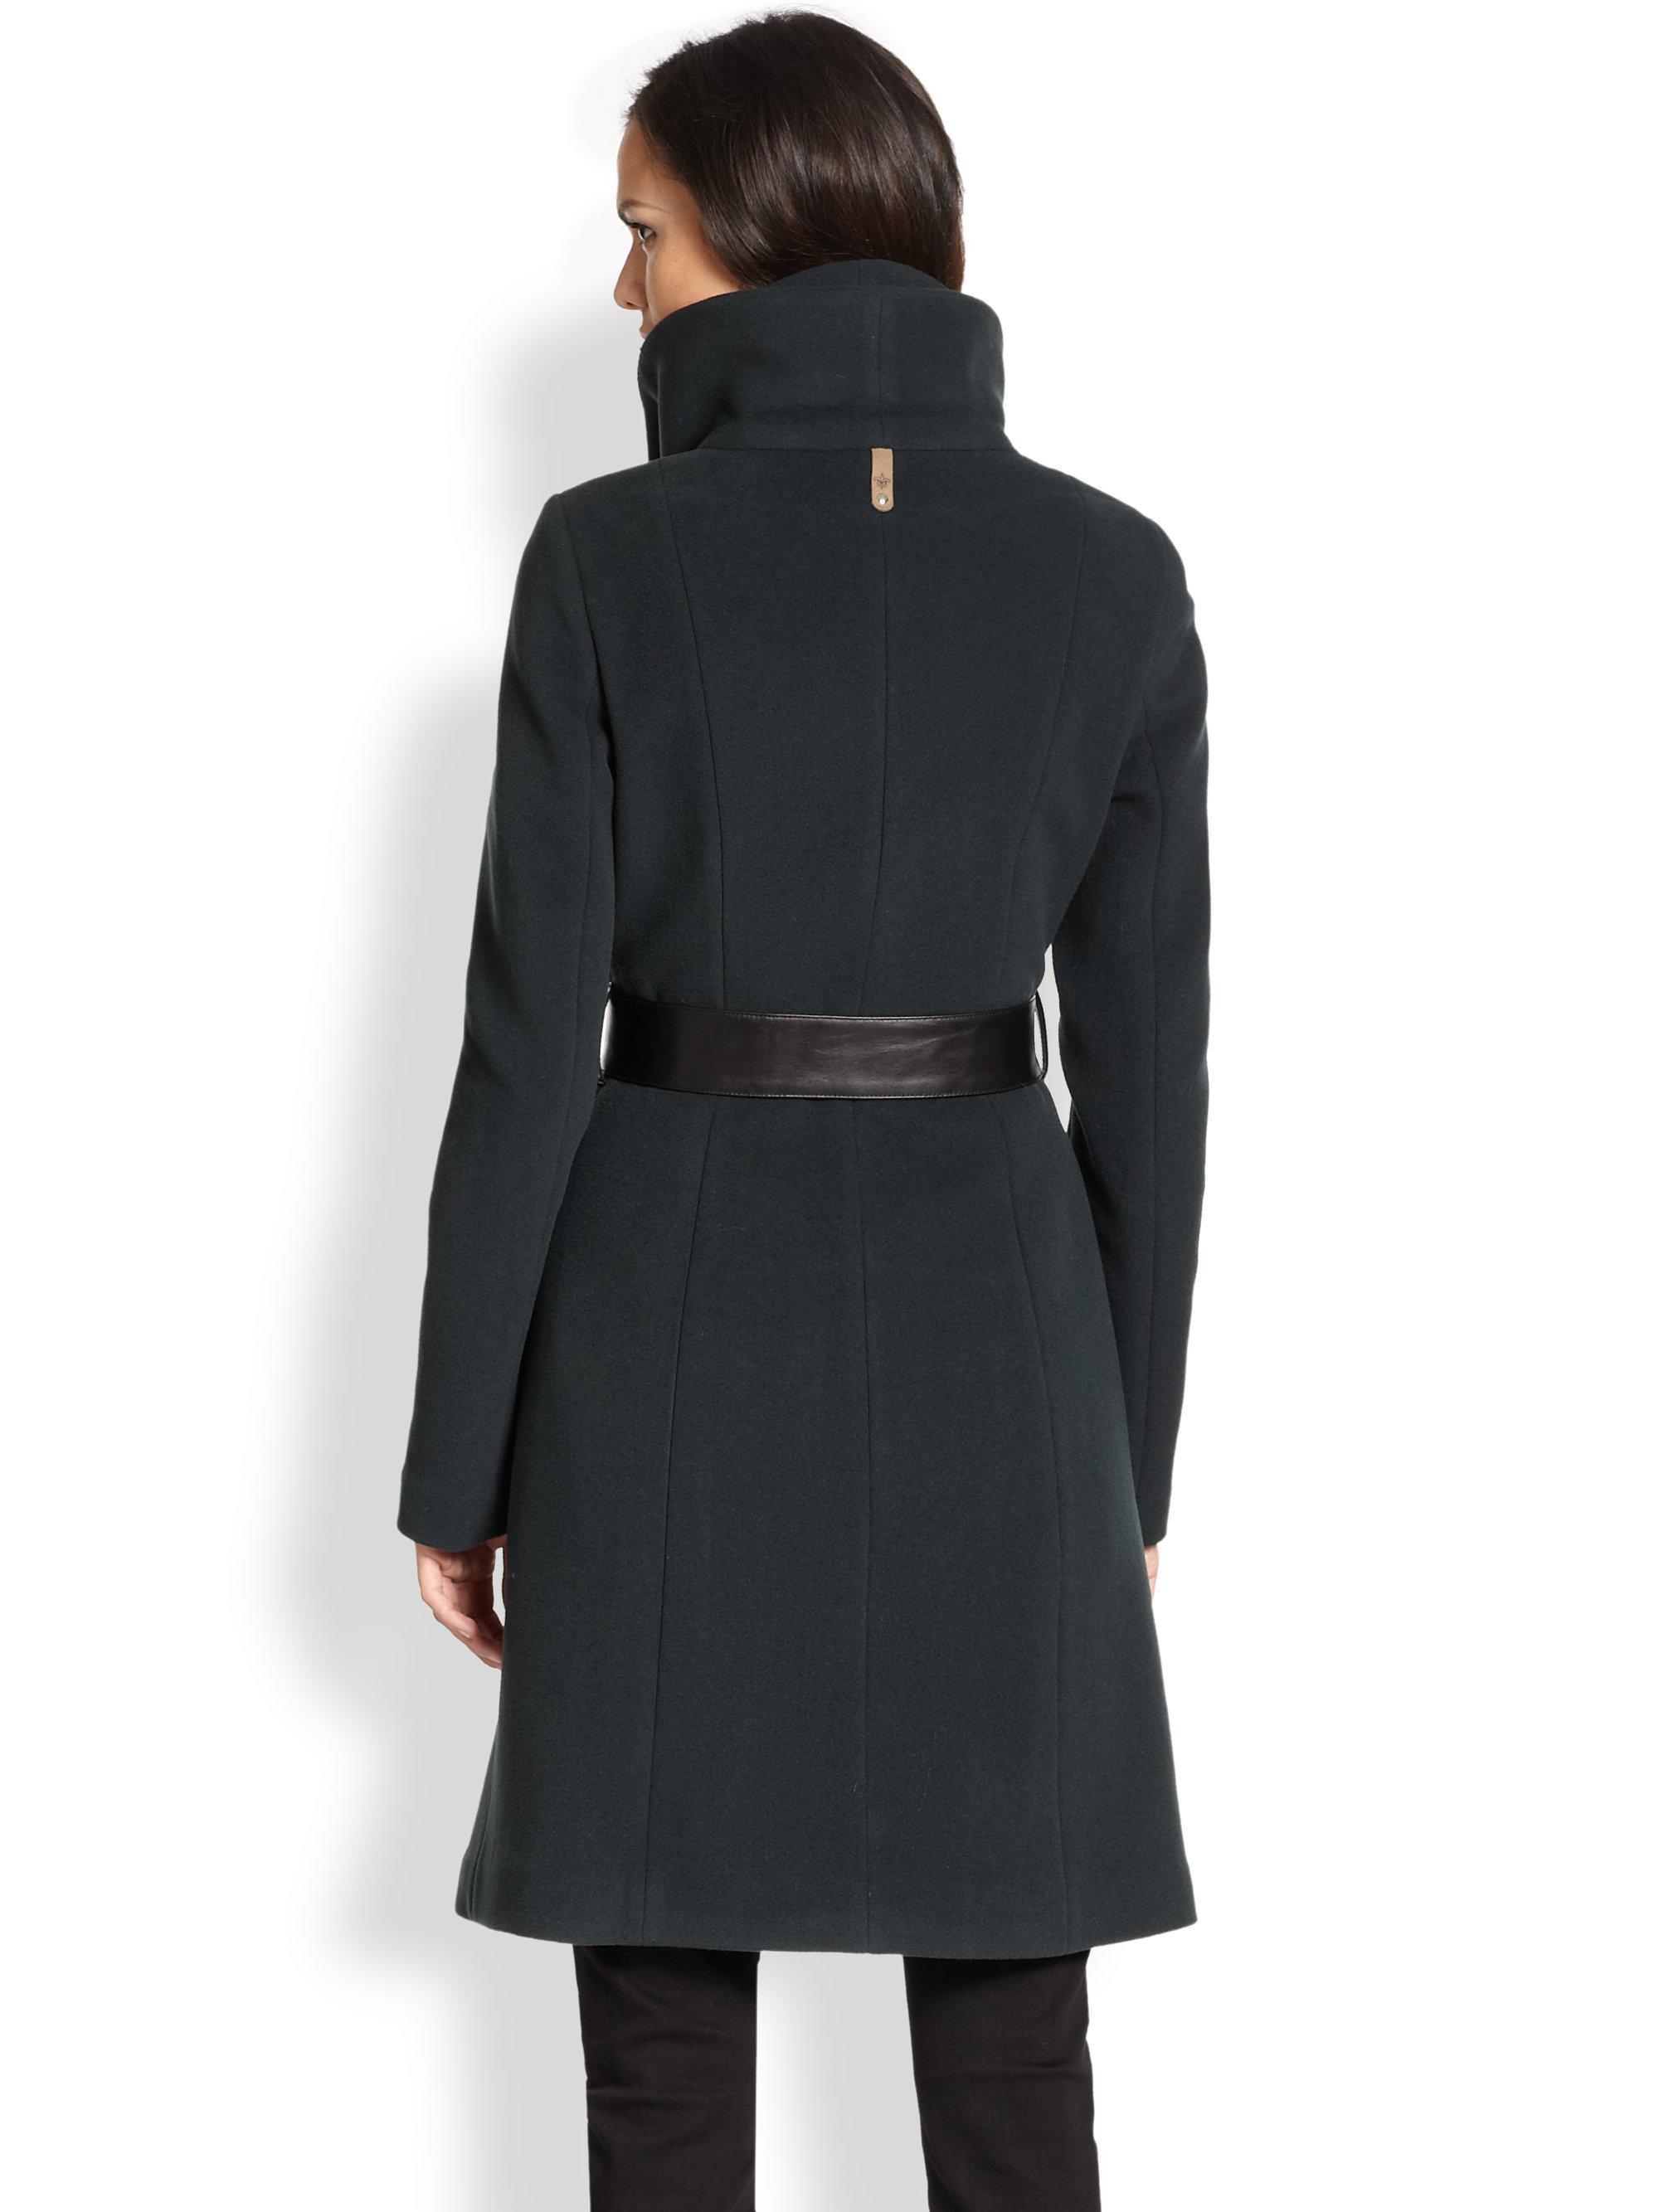 c8019feb3 italy mackage mens leather jacket ebay 00db3 c1571